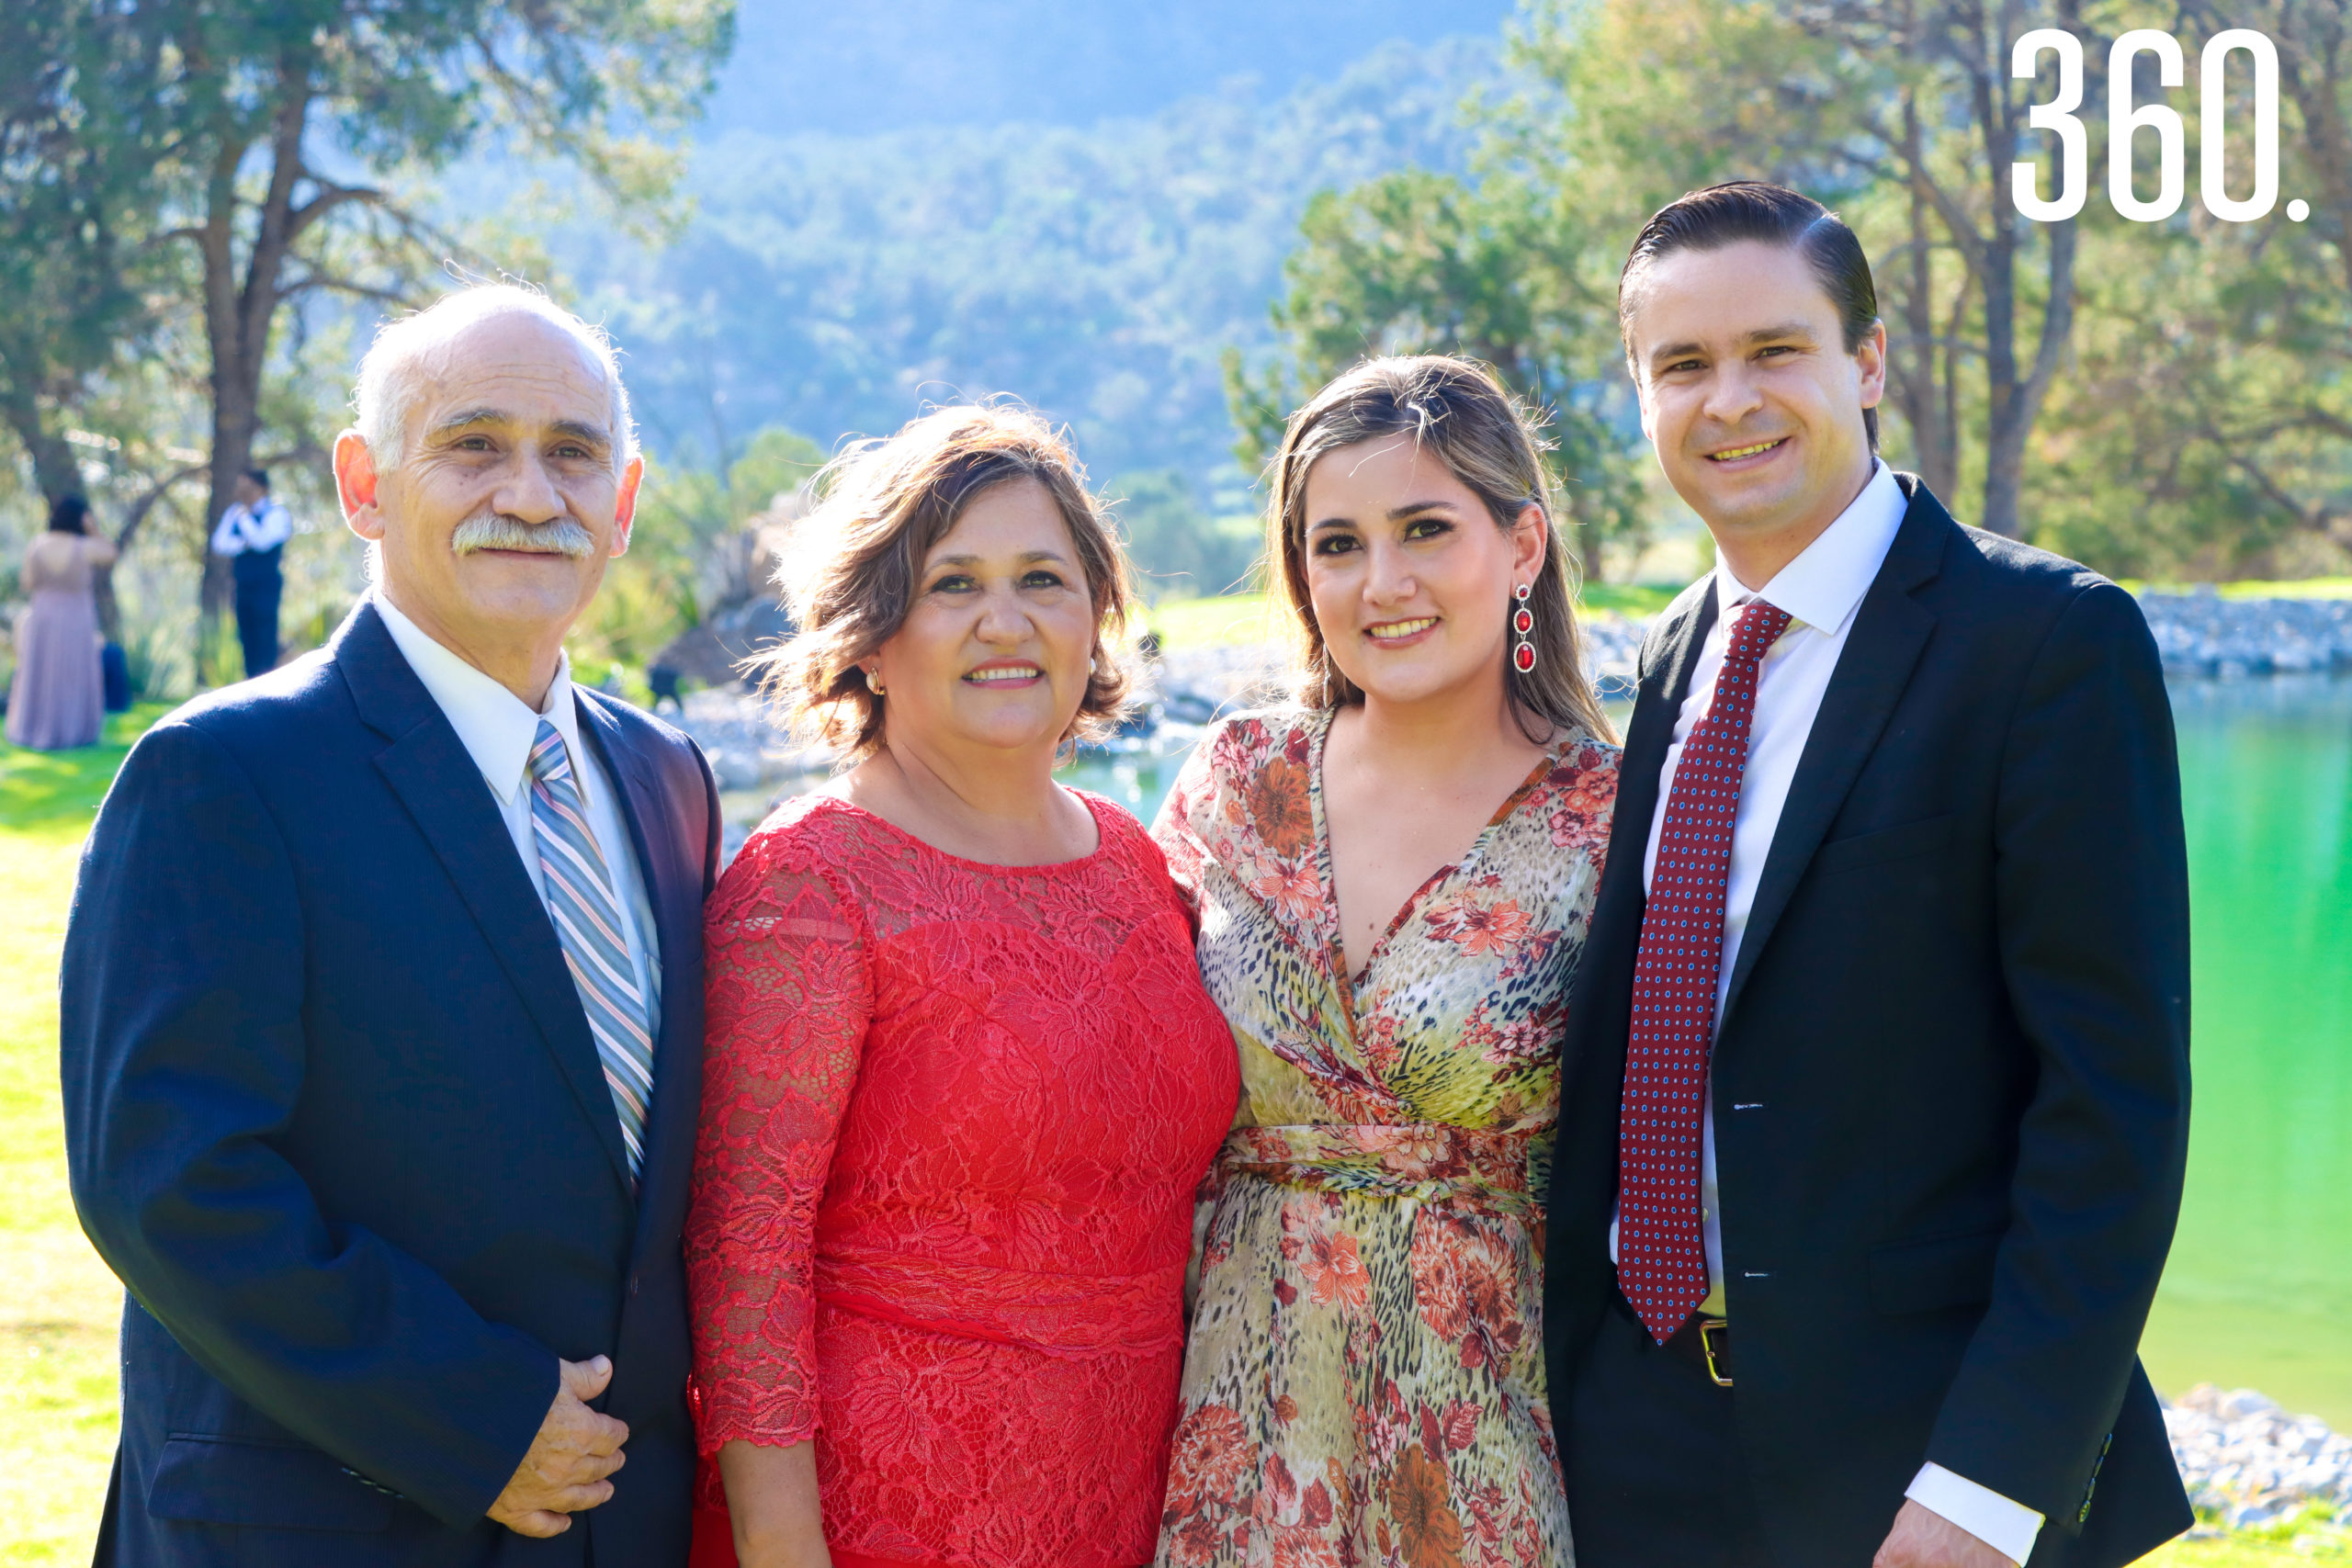 René Moreira, Alejandra Arredondo, Gabriela Moreira y Héctor Lozano.